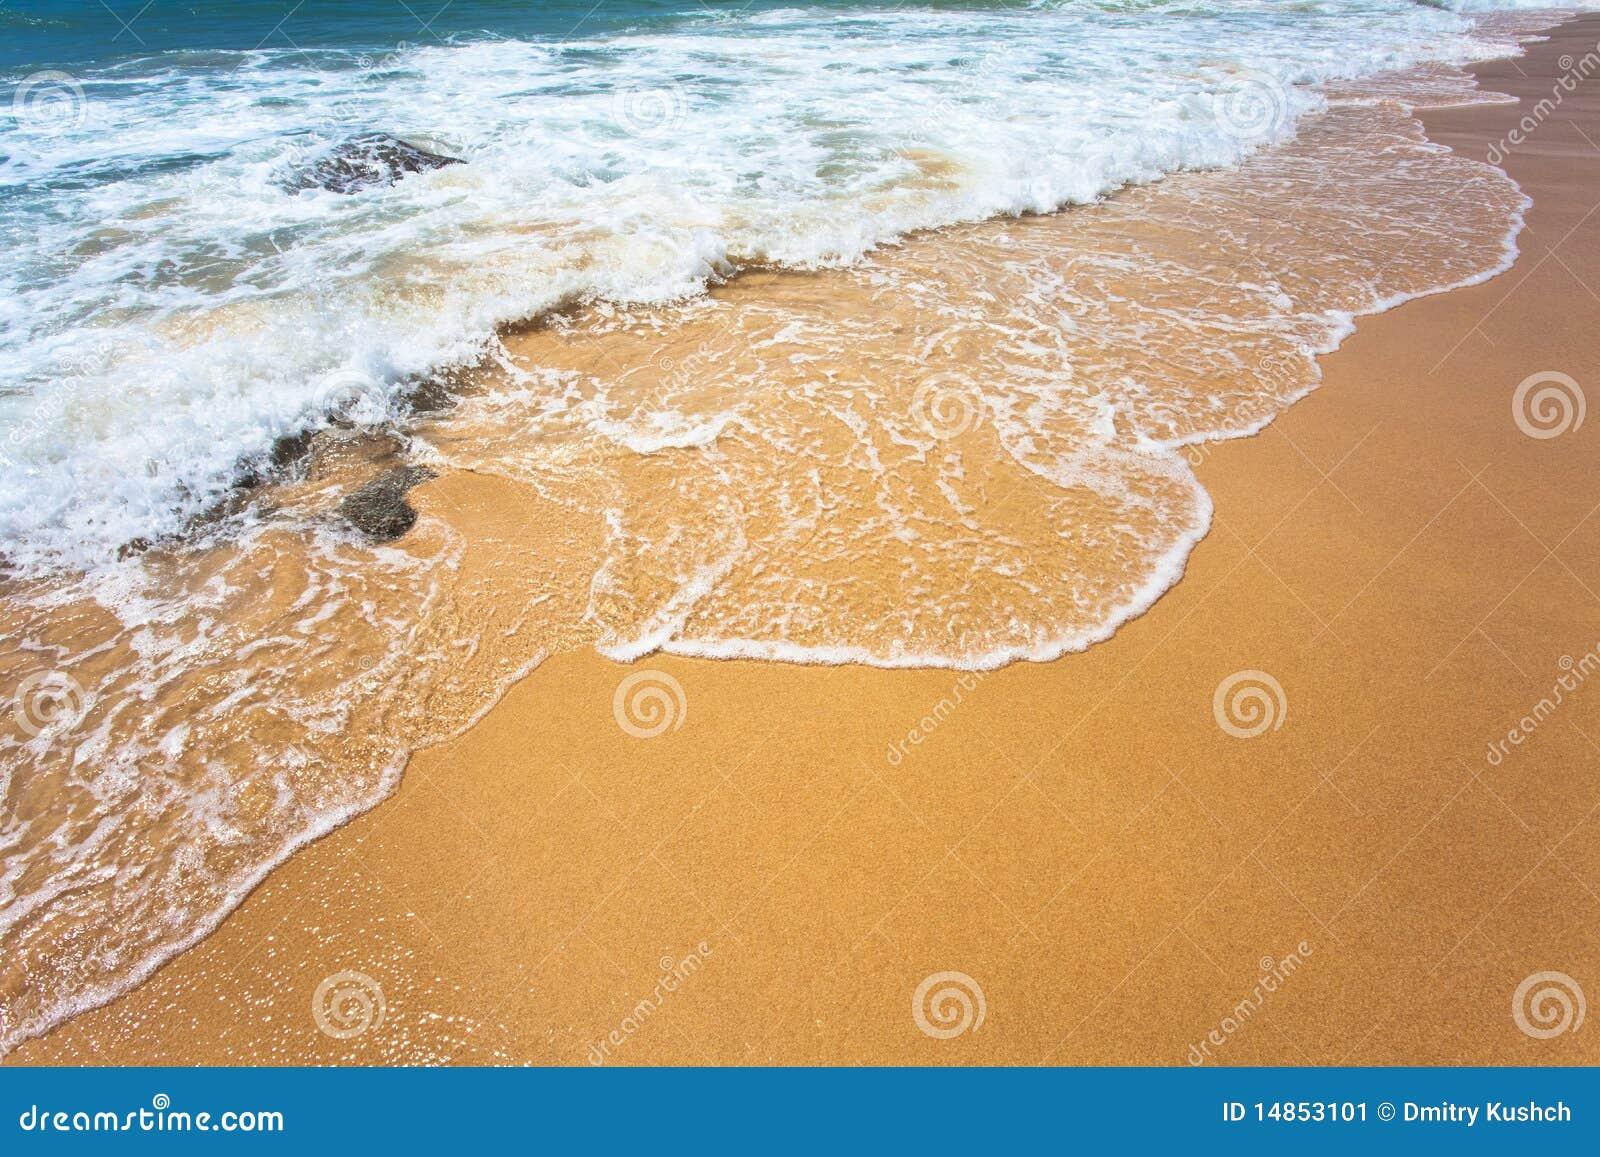 Sand and sea wave